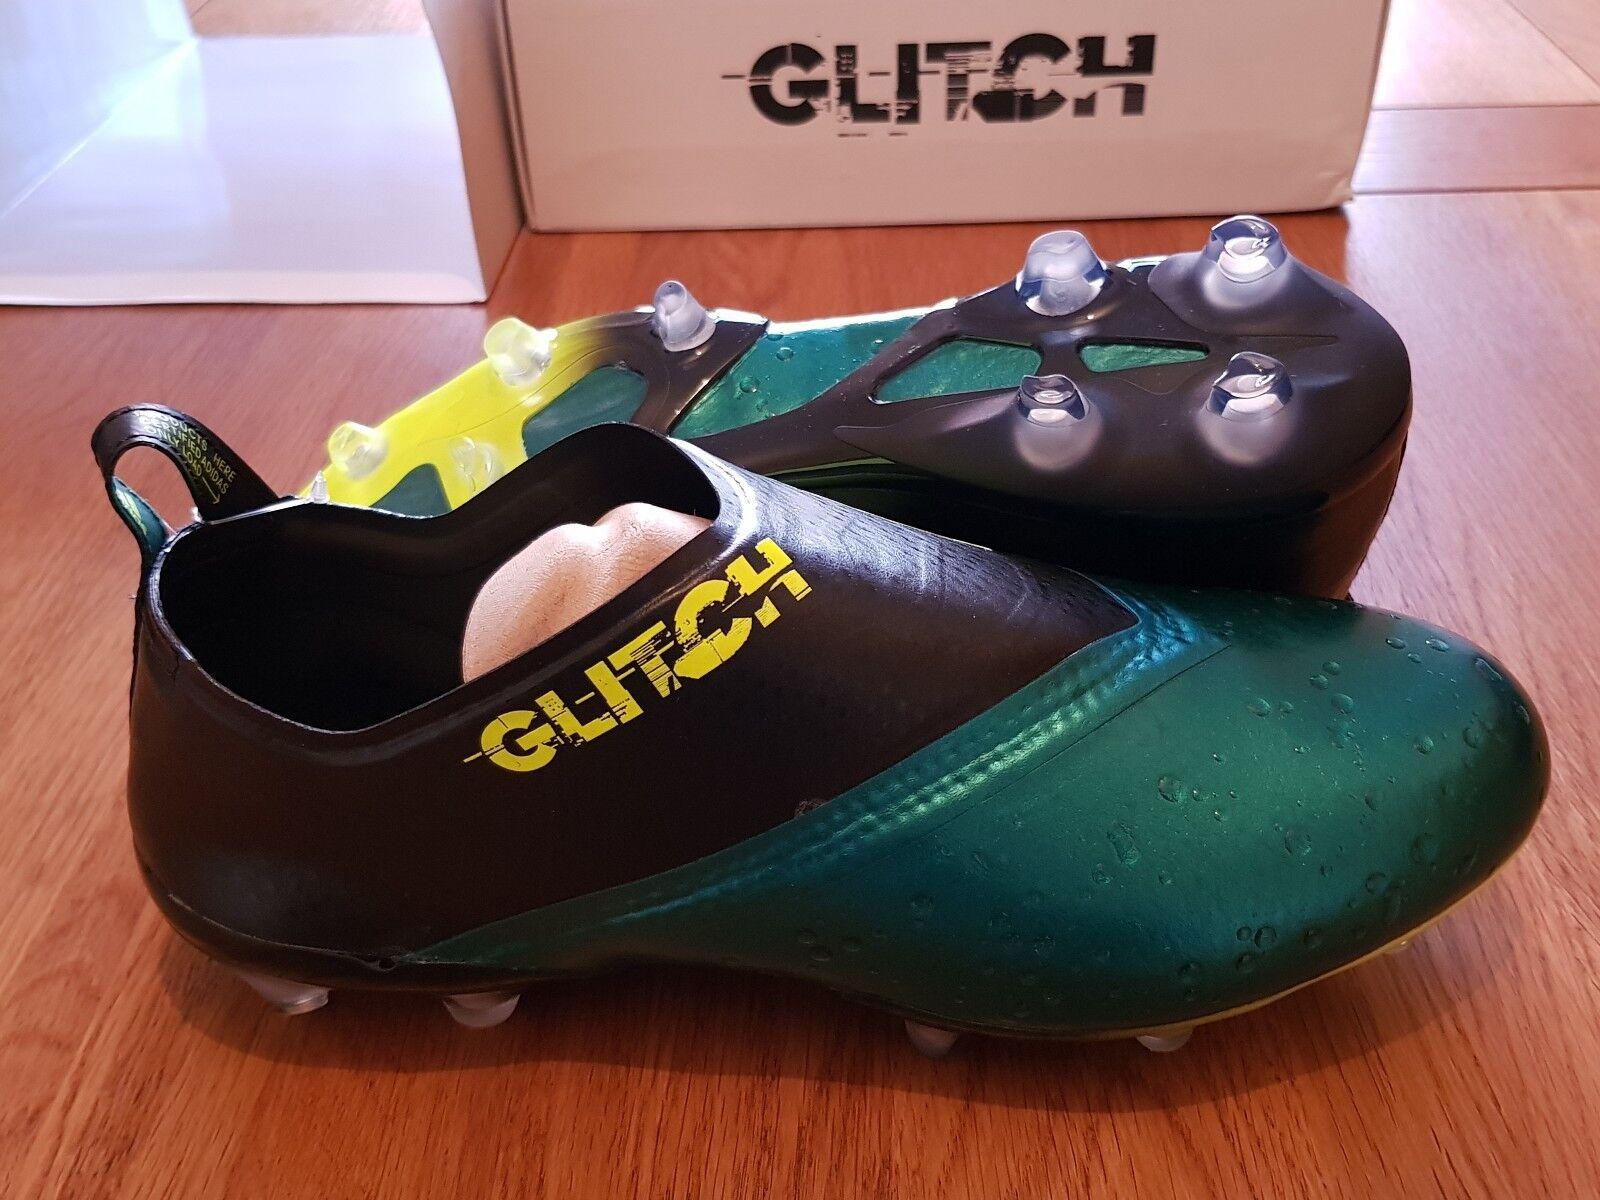 FG 2.0 Glitch ADIDAS esercitare verde 53 outerskin 9 Taglia